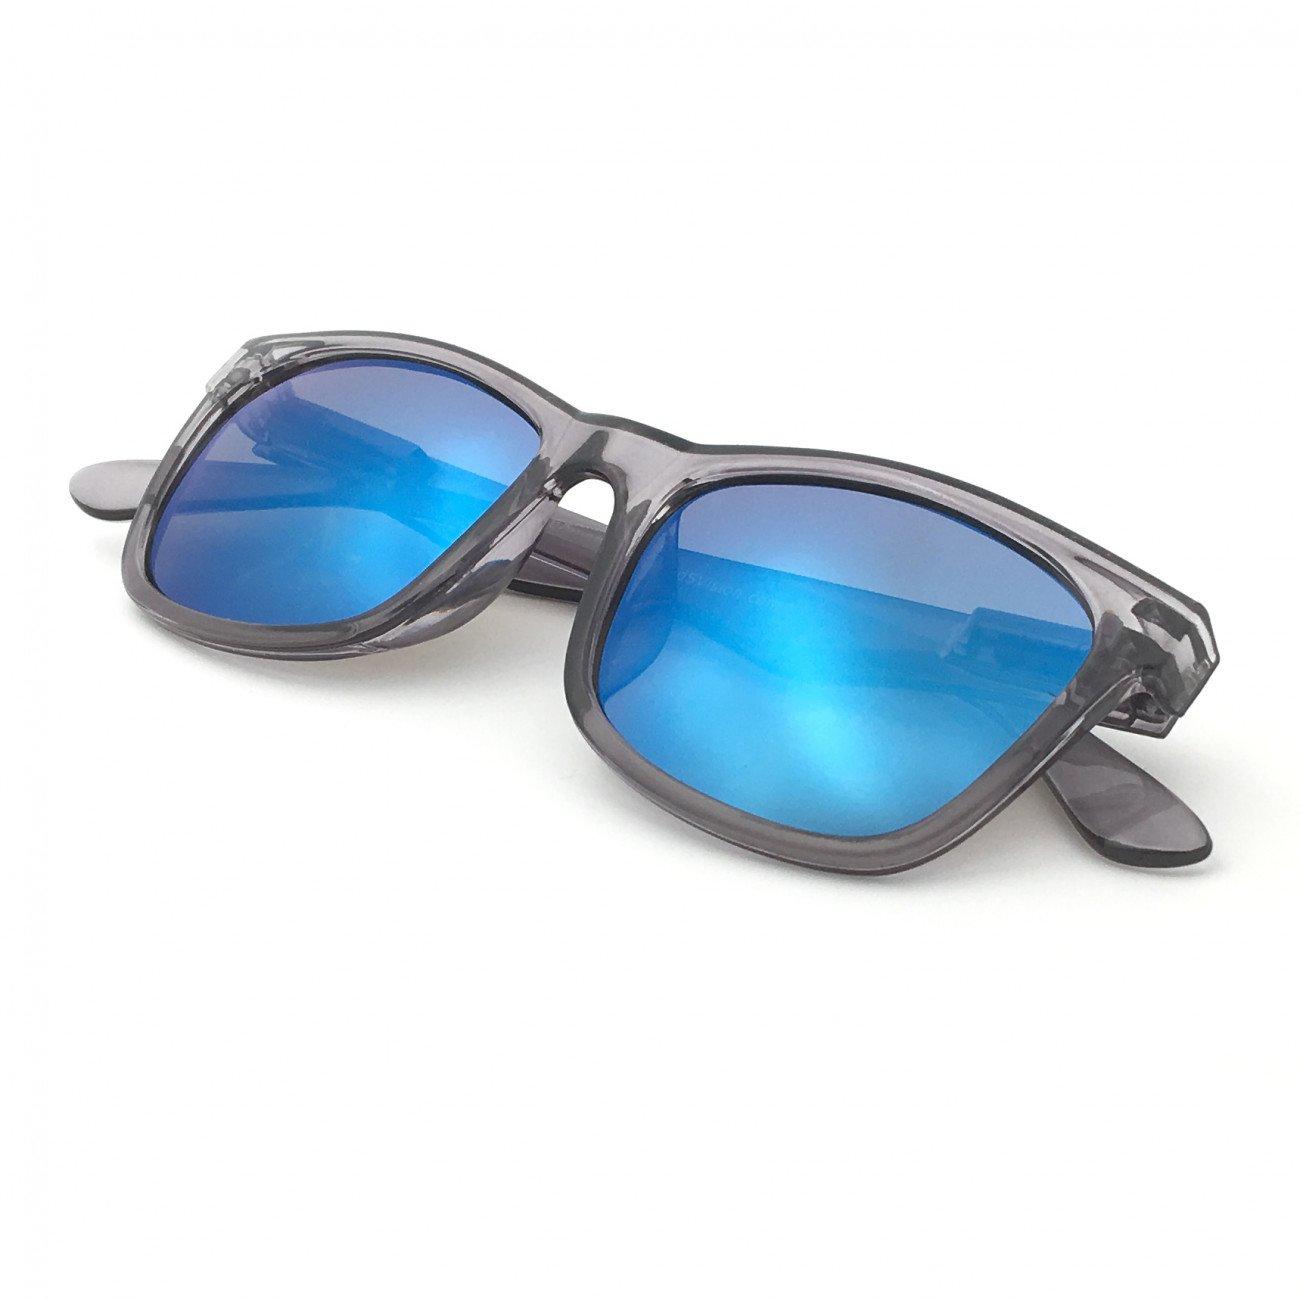 2eed280883 J+S Classic 80 s Wayfarer Mark II Sunglasses